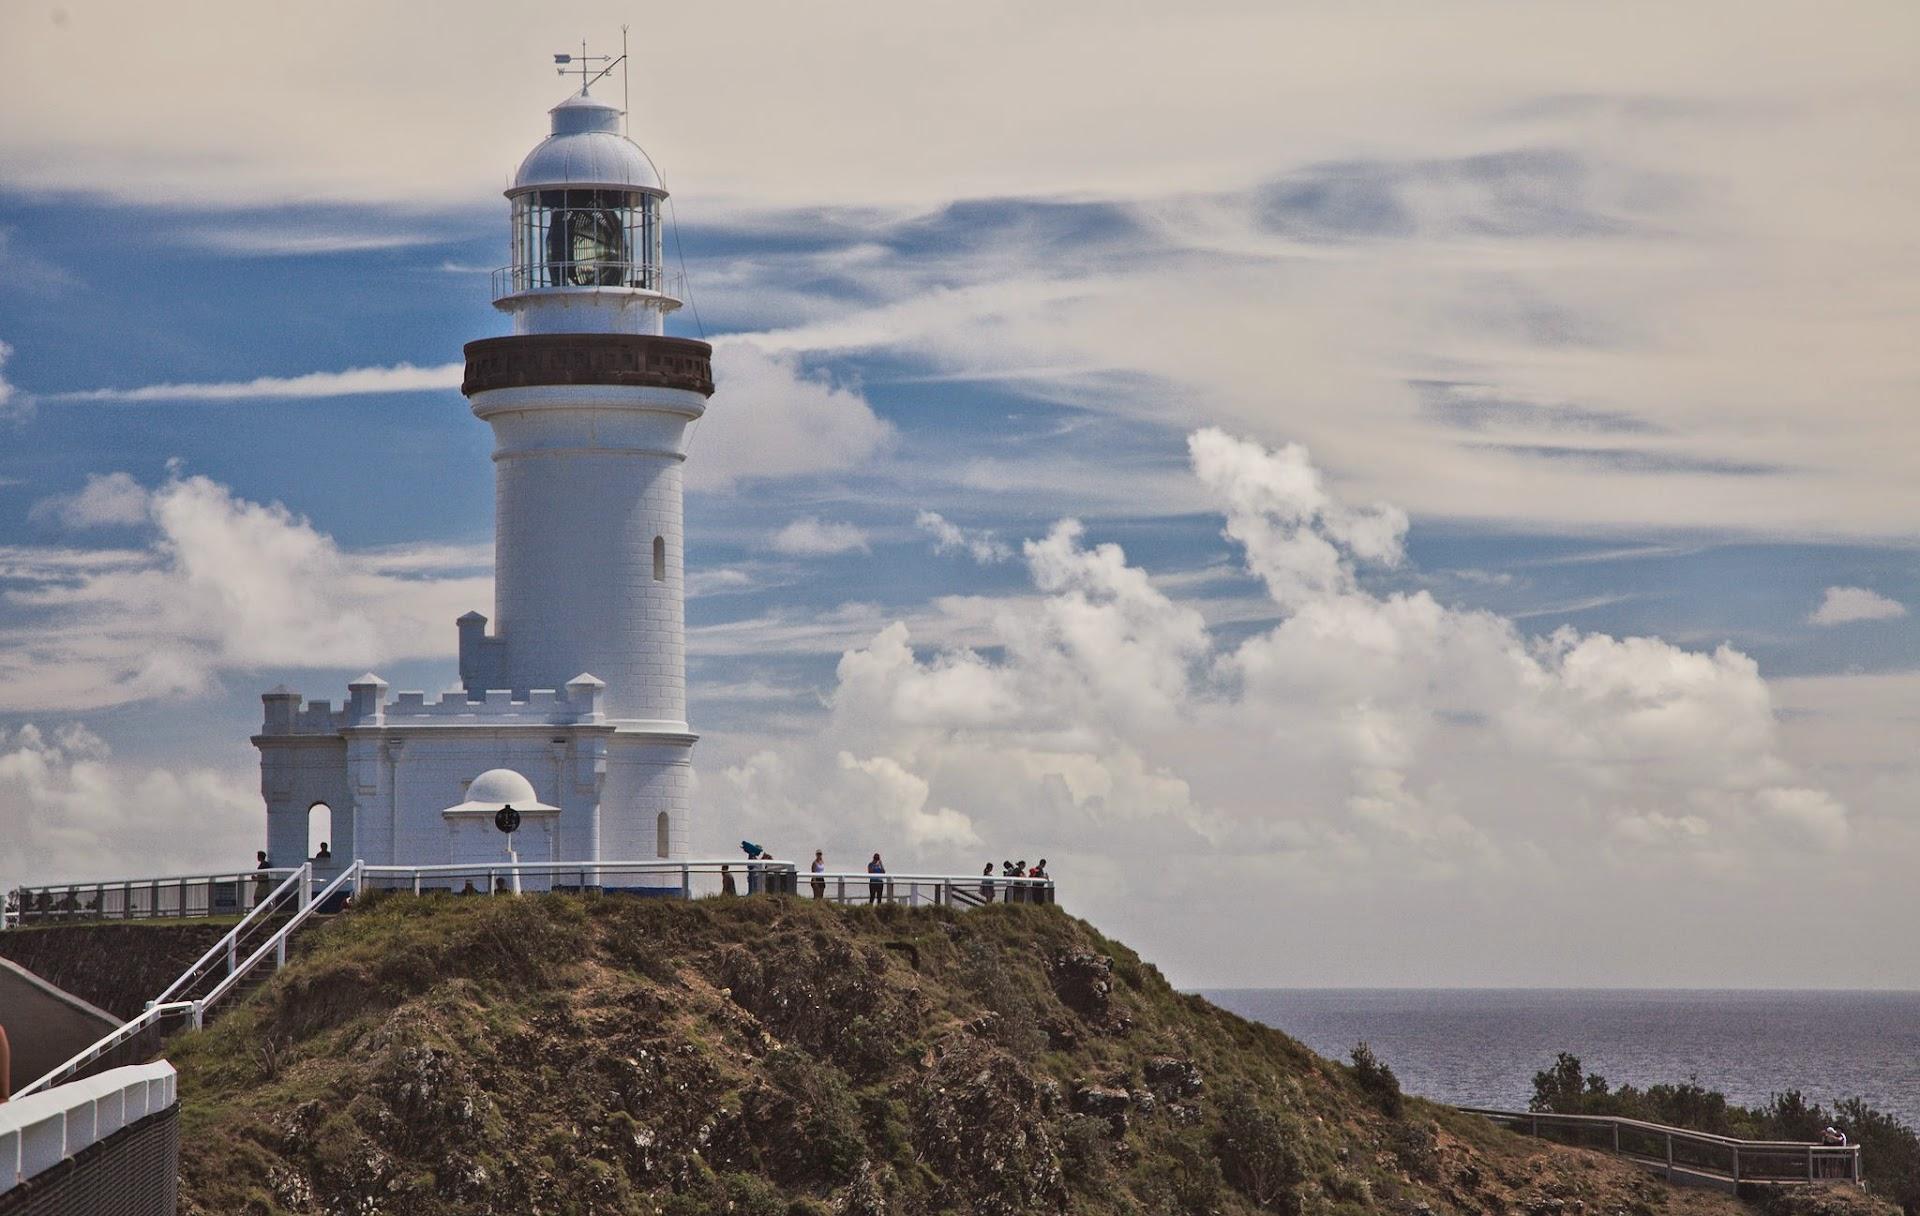 Autstralia's westernmost point, near Byron Bay